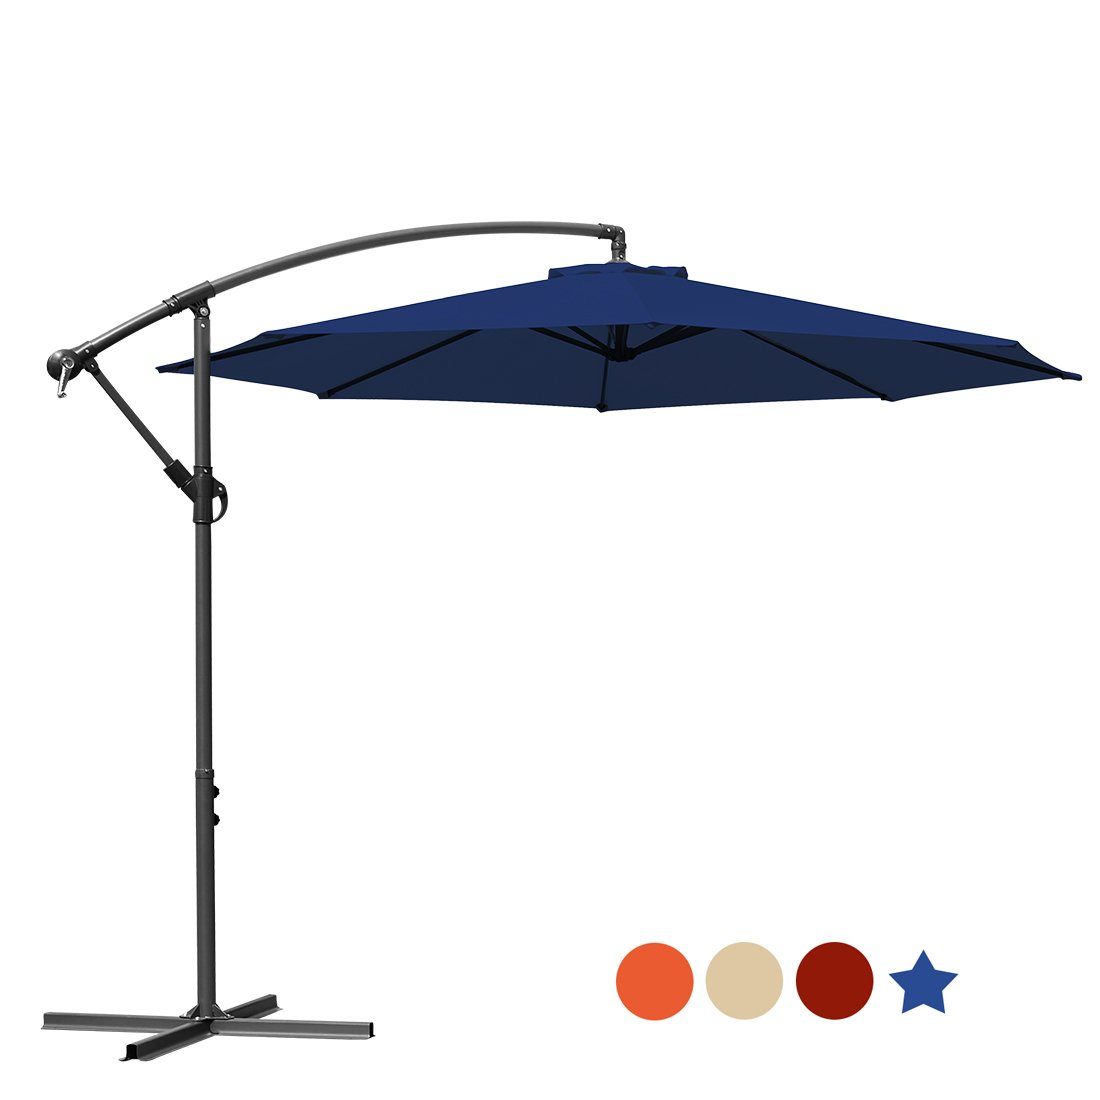 MASVIS 10 Ft Offset Cantilever Umbrella Outdoor Table Market Hanging Patio Umbrellas & Crank With Cross Base , 8 Ribs (Navy Blue)